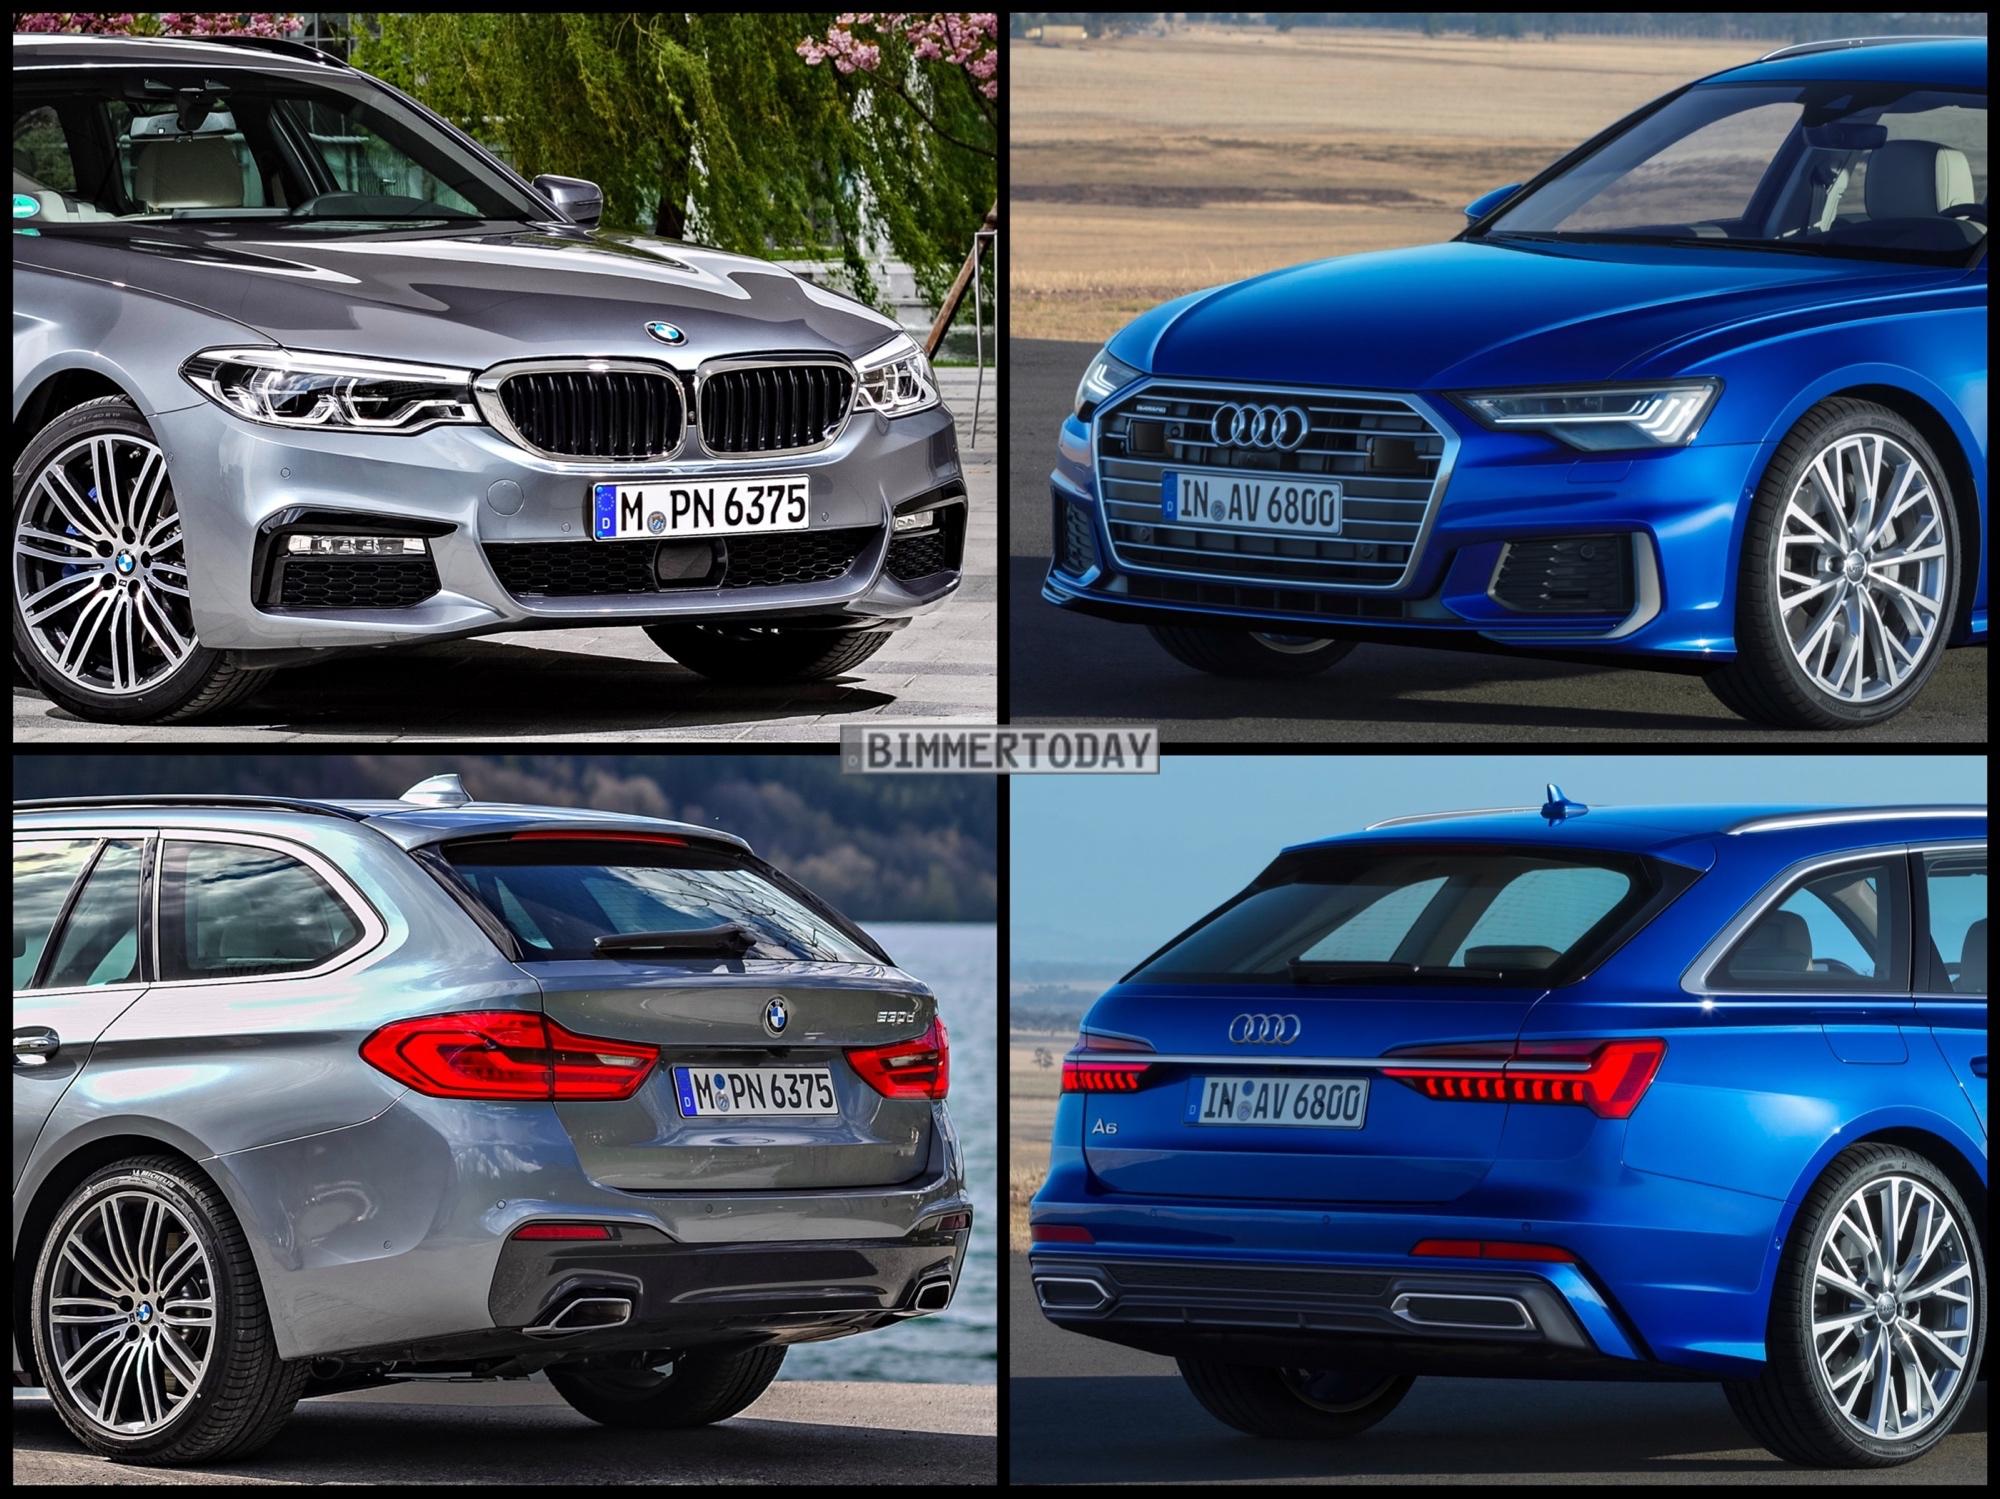 Bild Vergleich BMW 5er Touring G31 Audi A6 Avant C8 2018 01